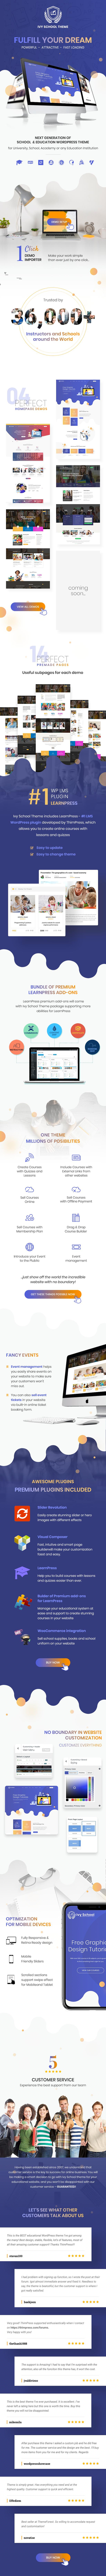 IvyPrep | Education & School WordPress Theme - 3